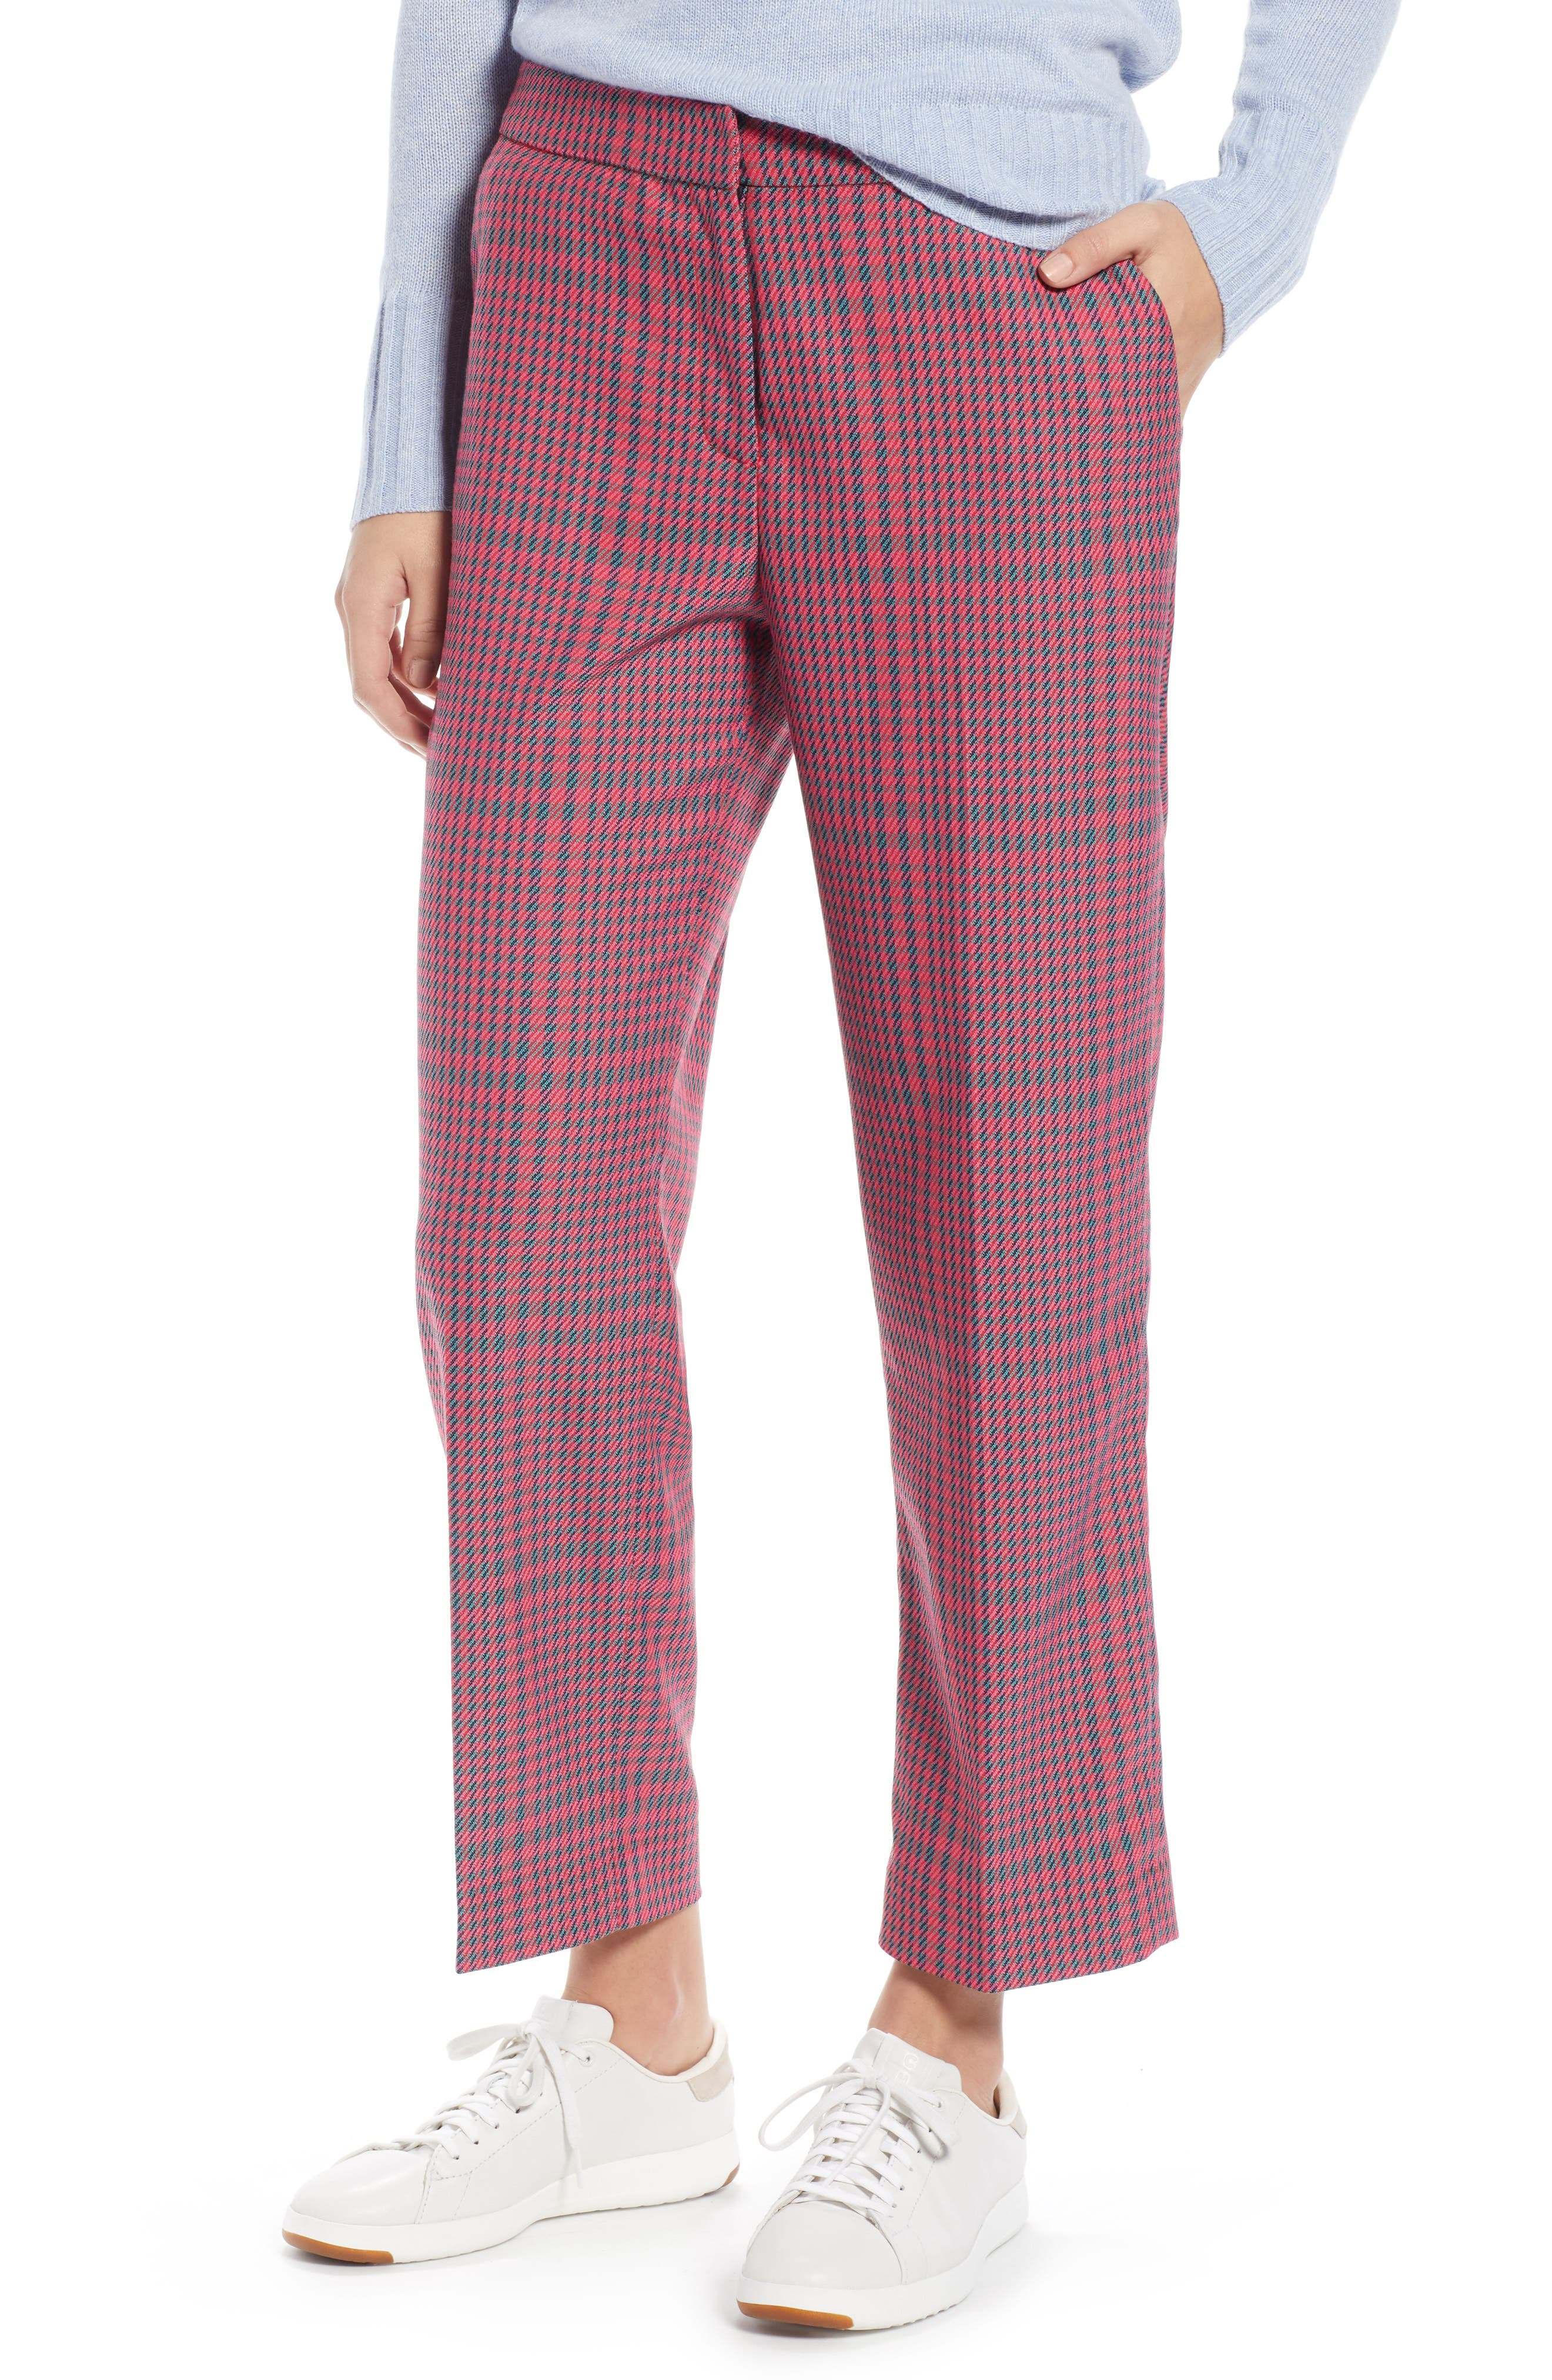 1901 Straight Leg Plaid Pants, Main, color, 651